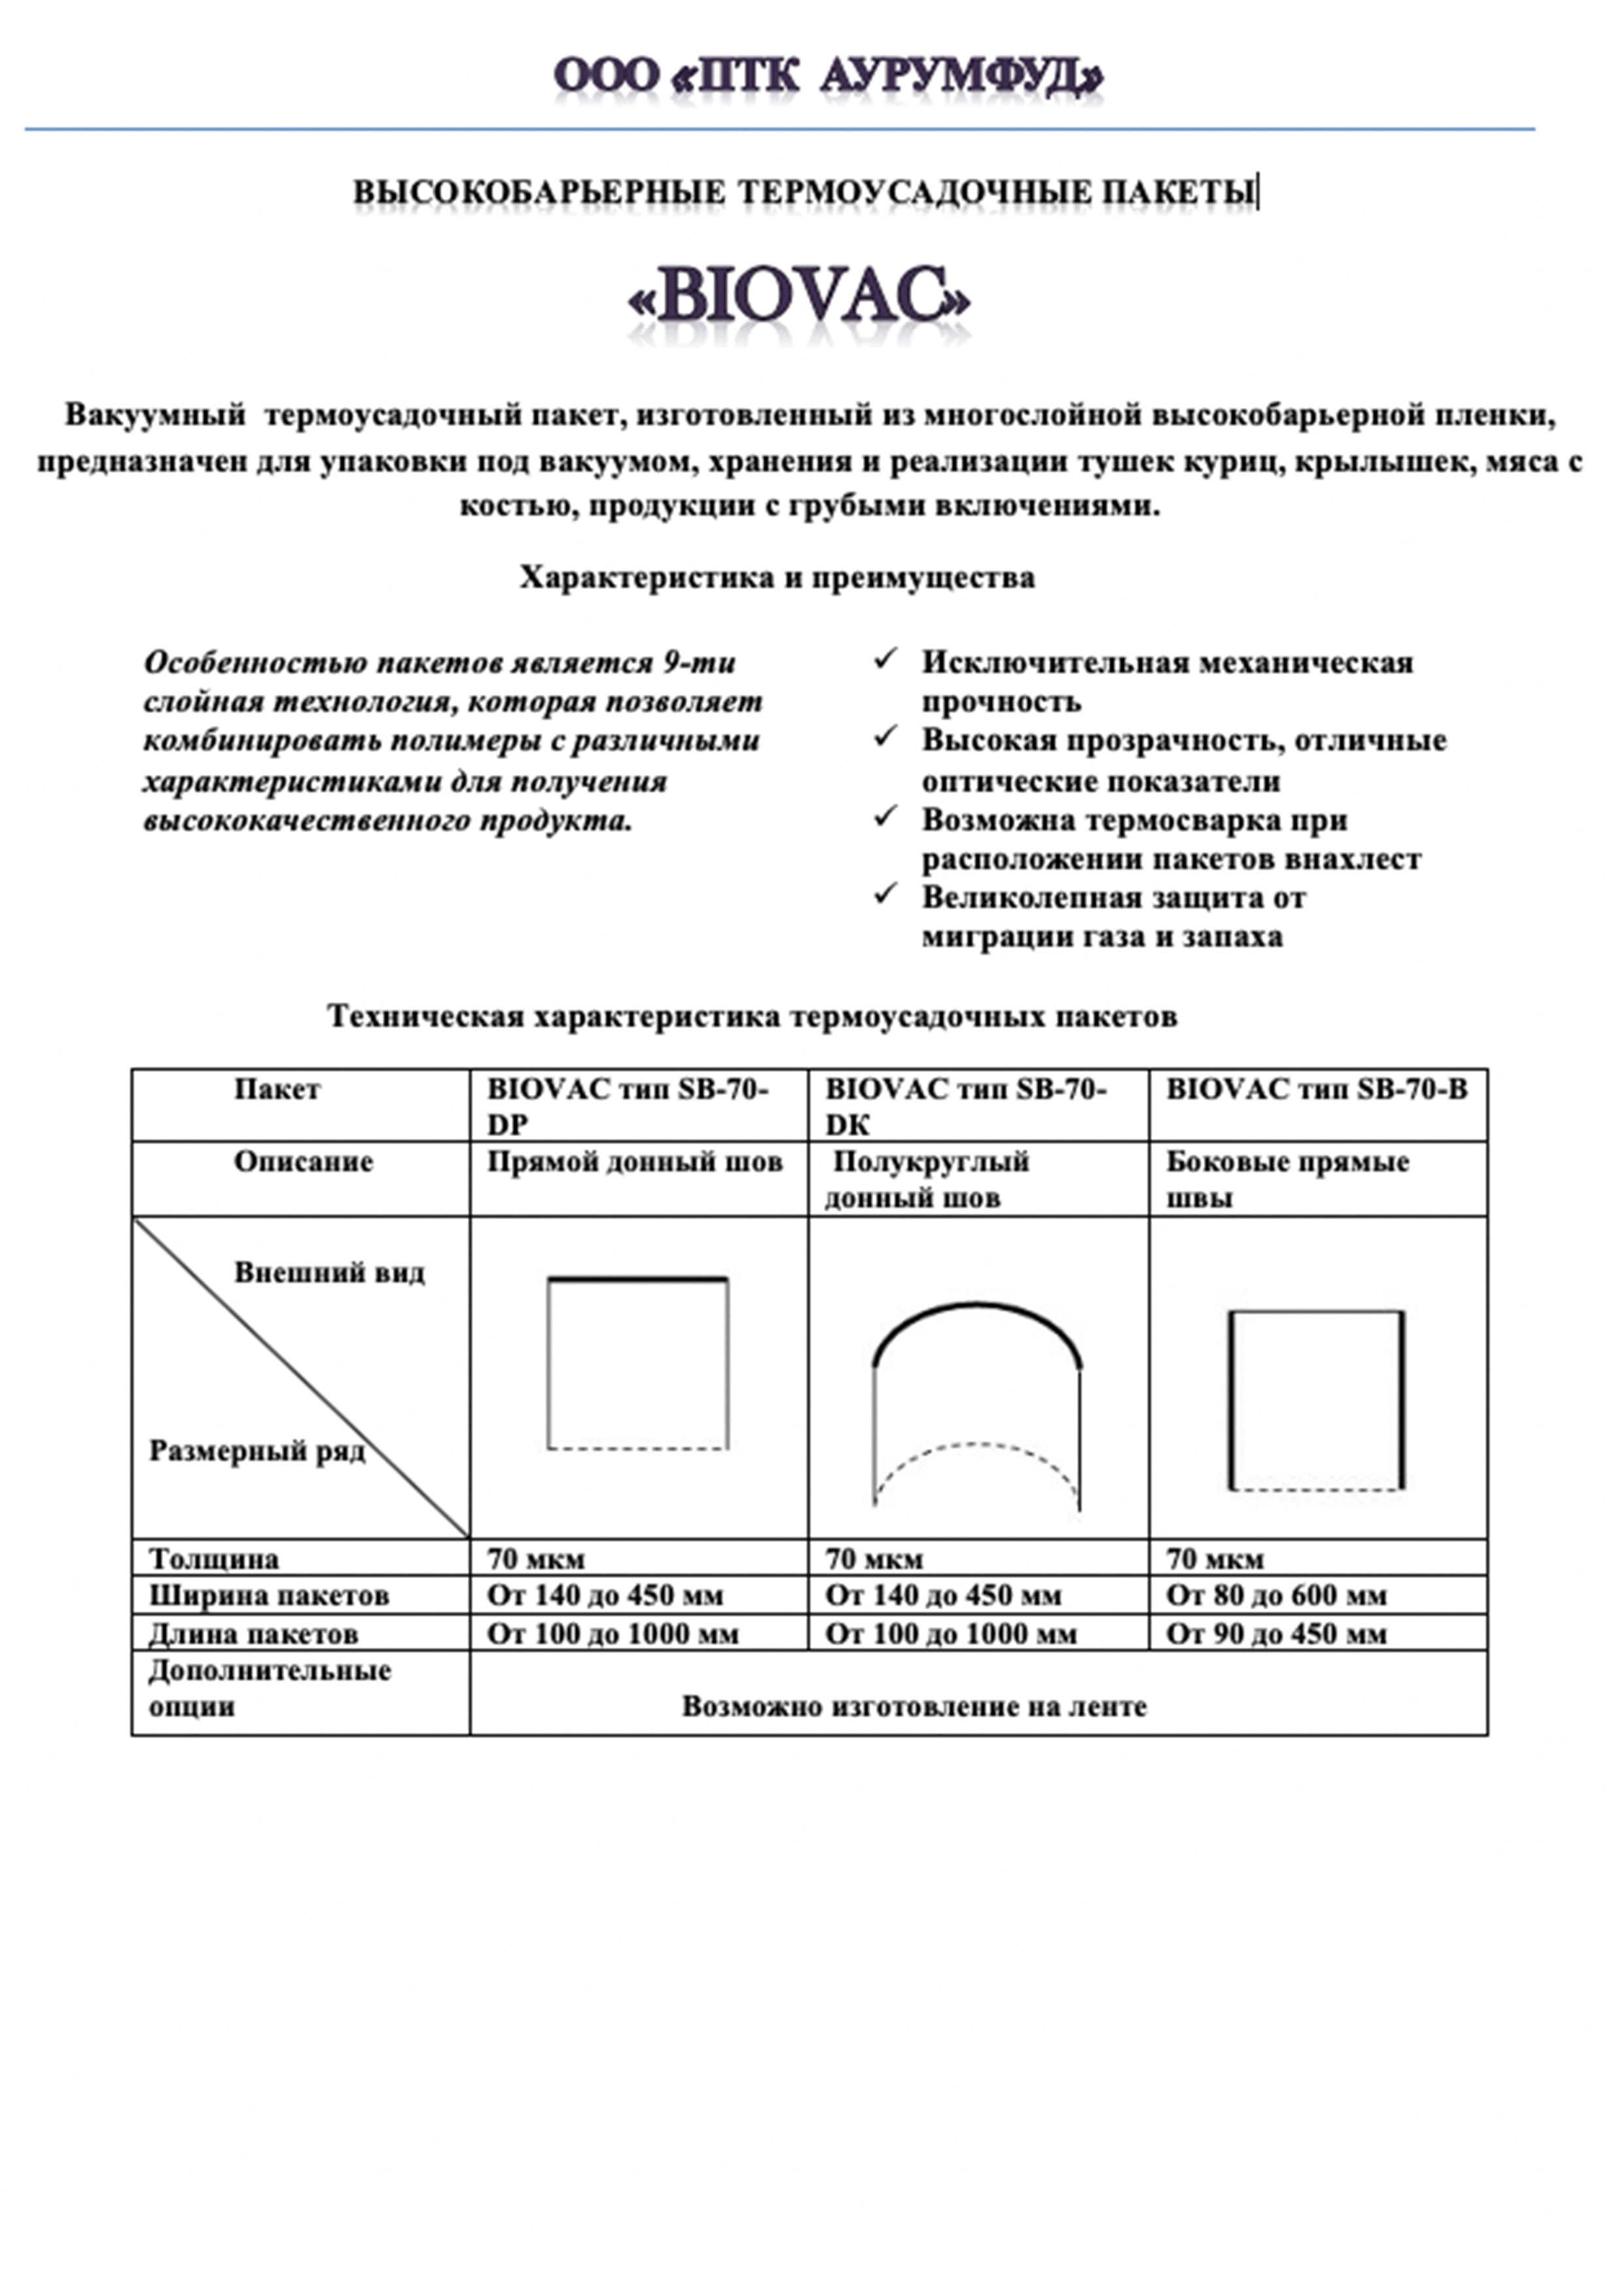 BIOVAC SB 70 Тех инструкции